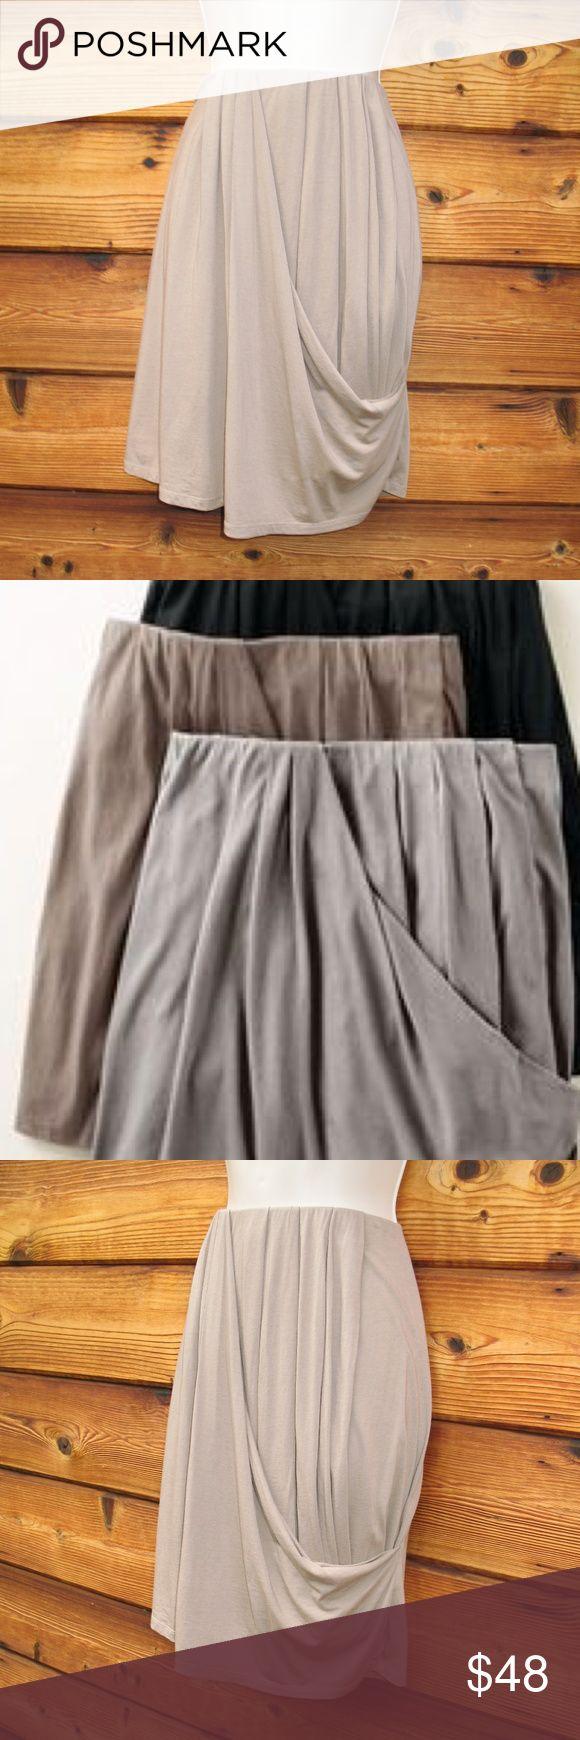 "NEW Garnet Hill Tulip Jersey Mini Skirt XL Garnet Hill Draped Front Cotton Modal Skirt NWOT   Details: Garnet Hill  Color: Beige  Size: XL  Elastic waistband  Drape/pleated front  Straight back  60% Cotton/40% Modal   Measurements:  Length: 22""  Waist: 36-46""  Hips: 44 Garnet Hill Skirts Mini"